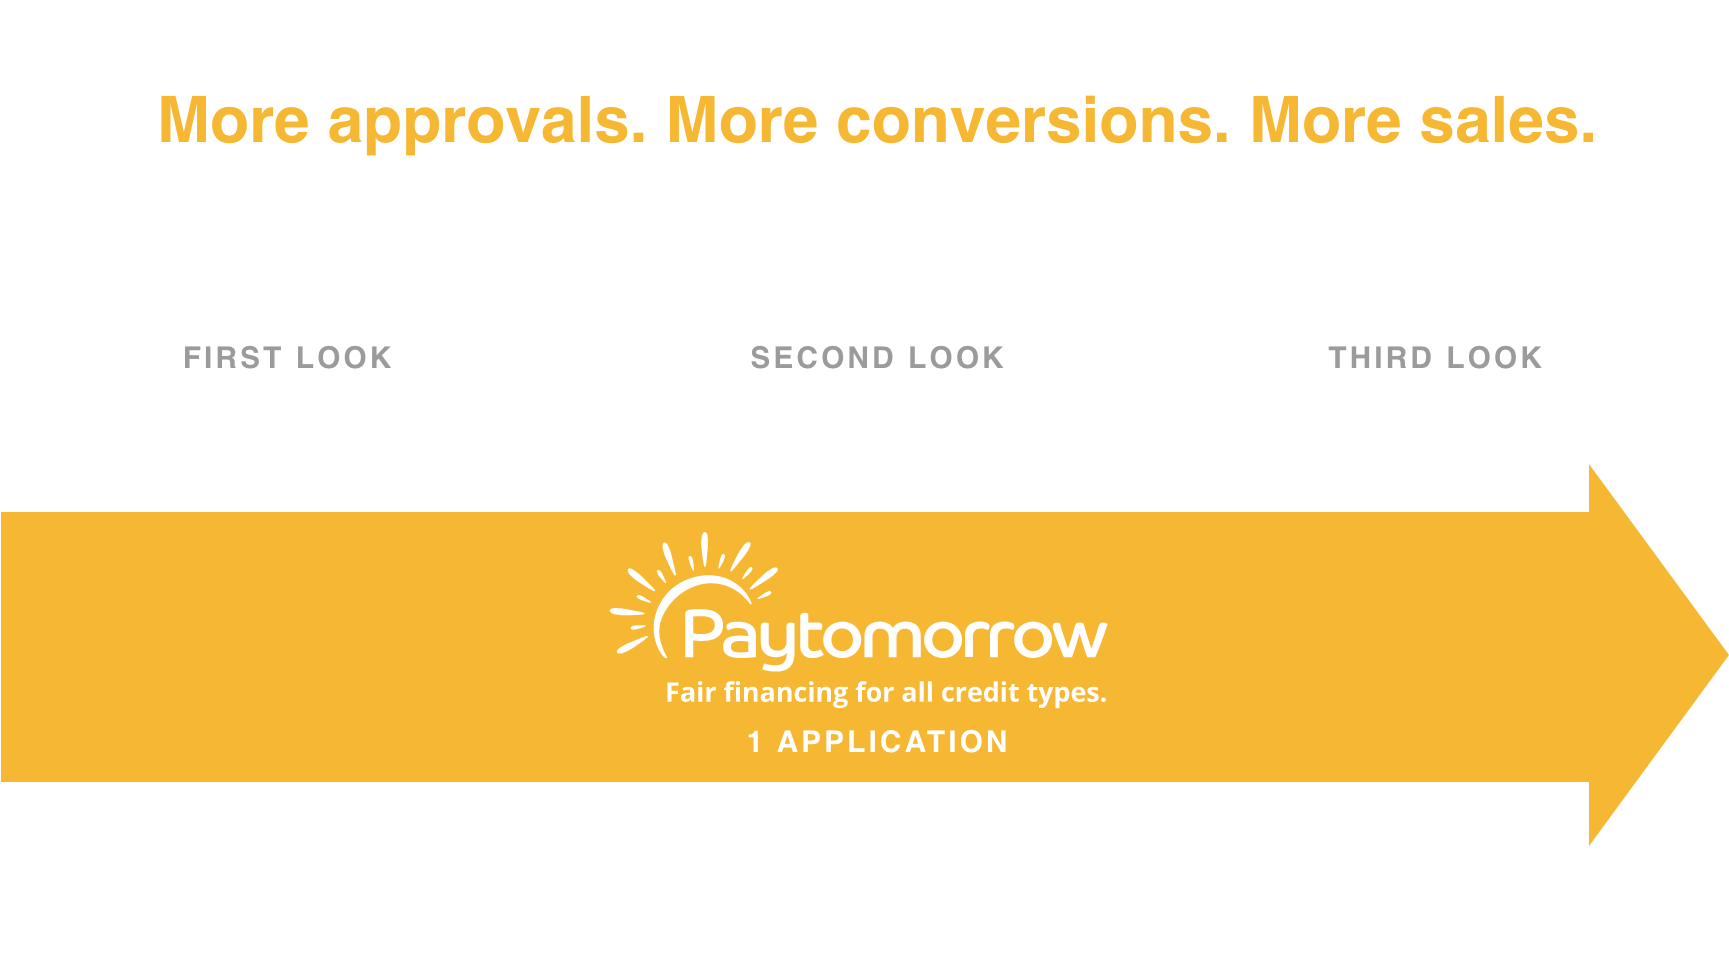 Full-Spectrum-Financing@2x1